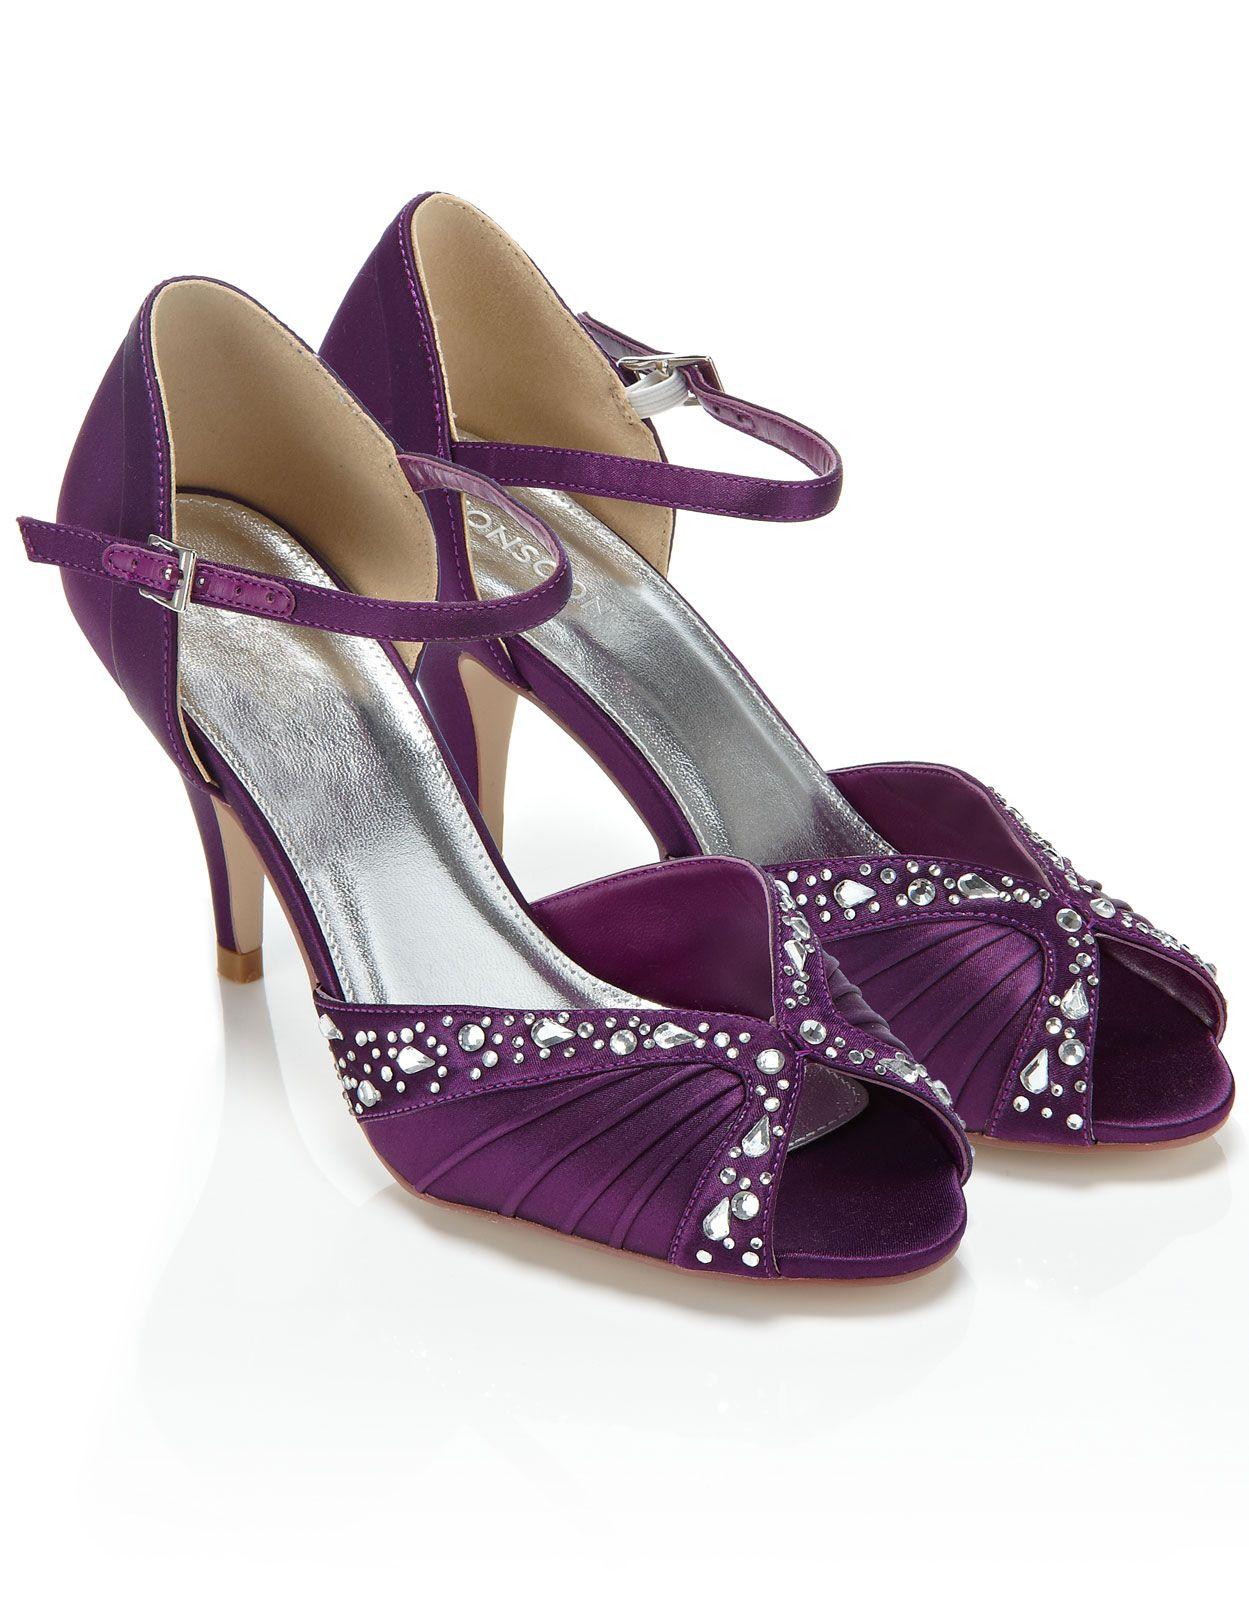 Beau Evelyn Diamante Bridal Shoe · Low Heel BootsLow HeelsPurple ...